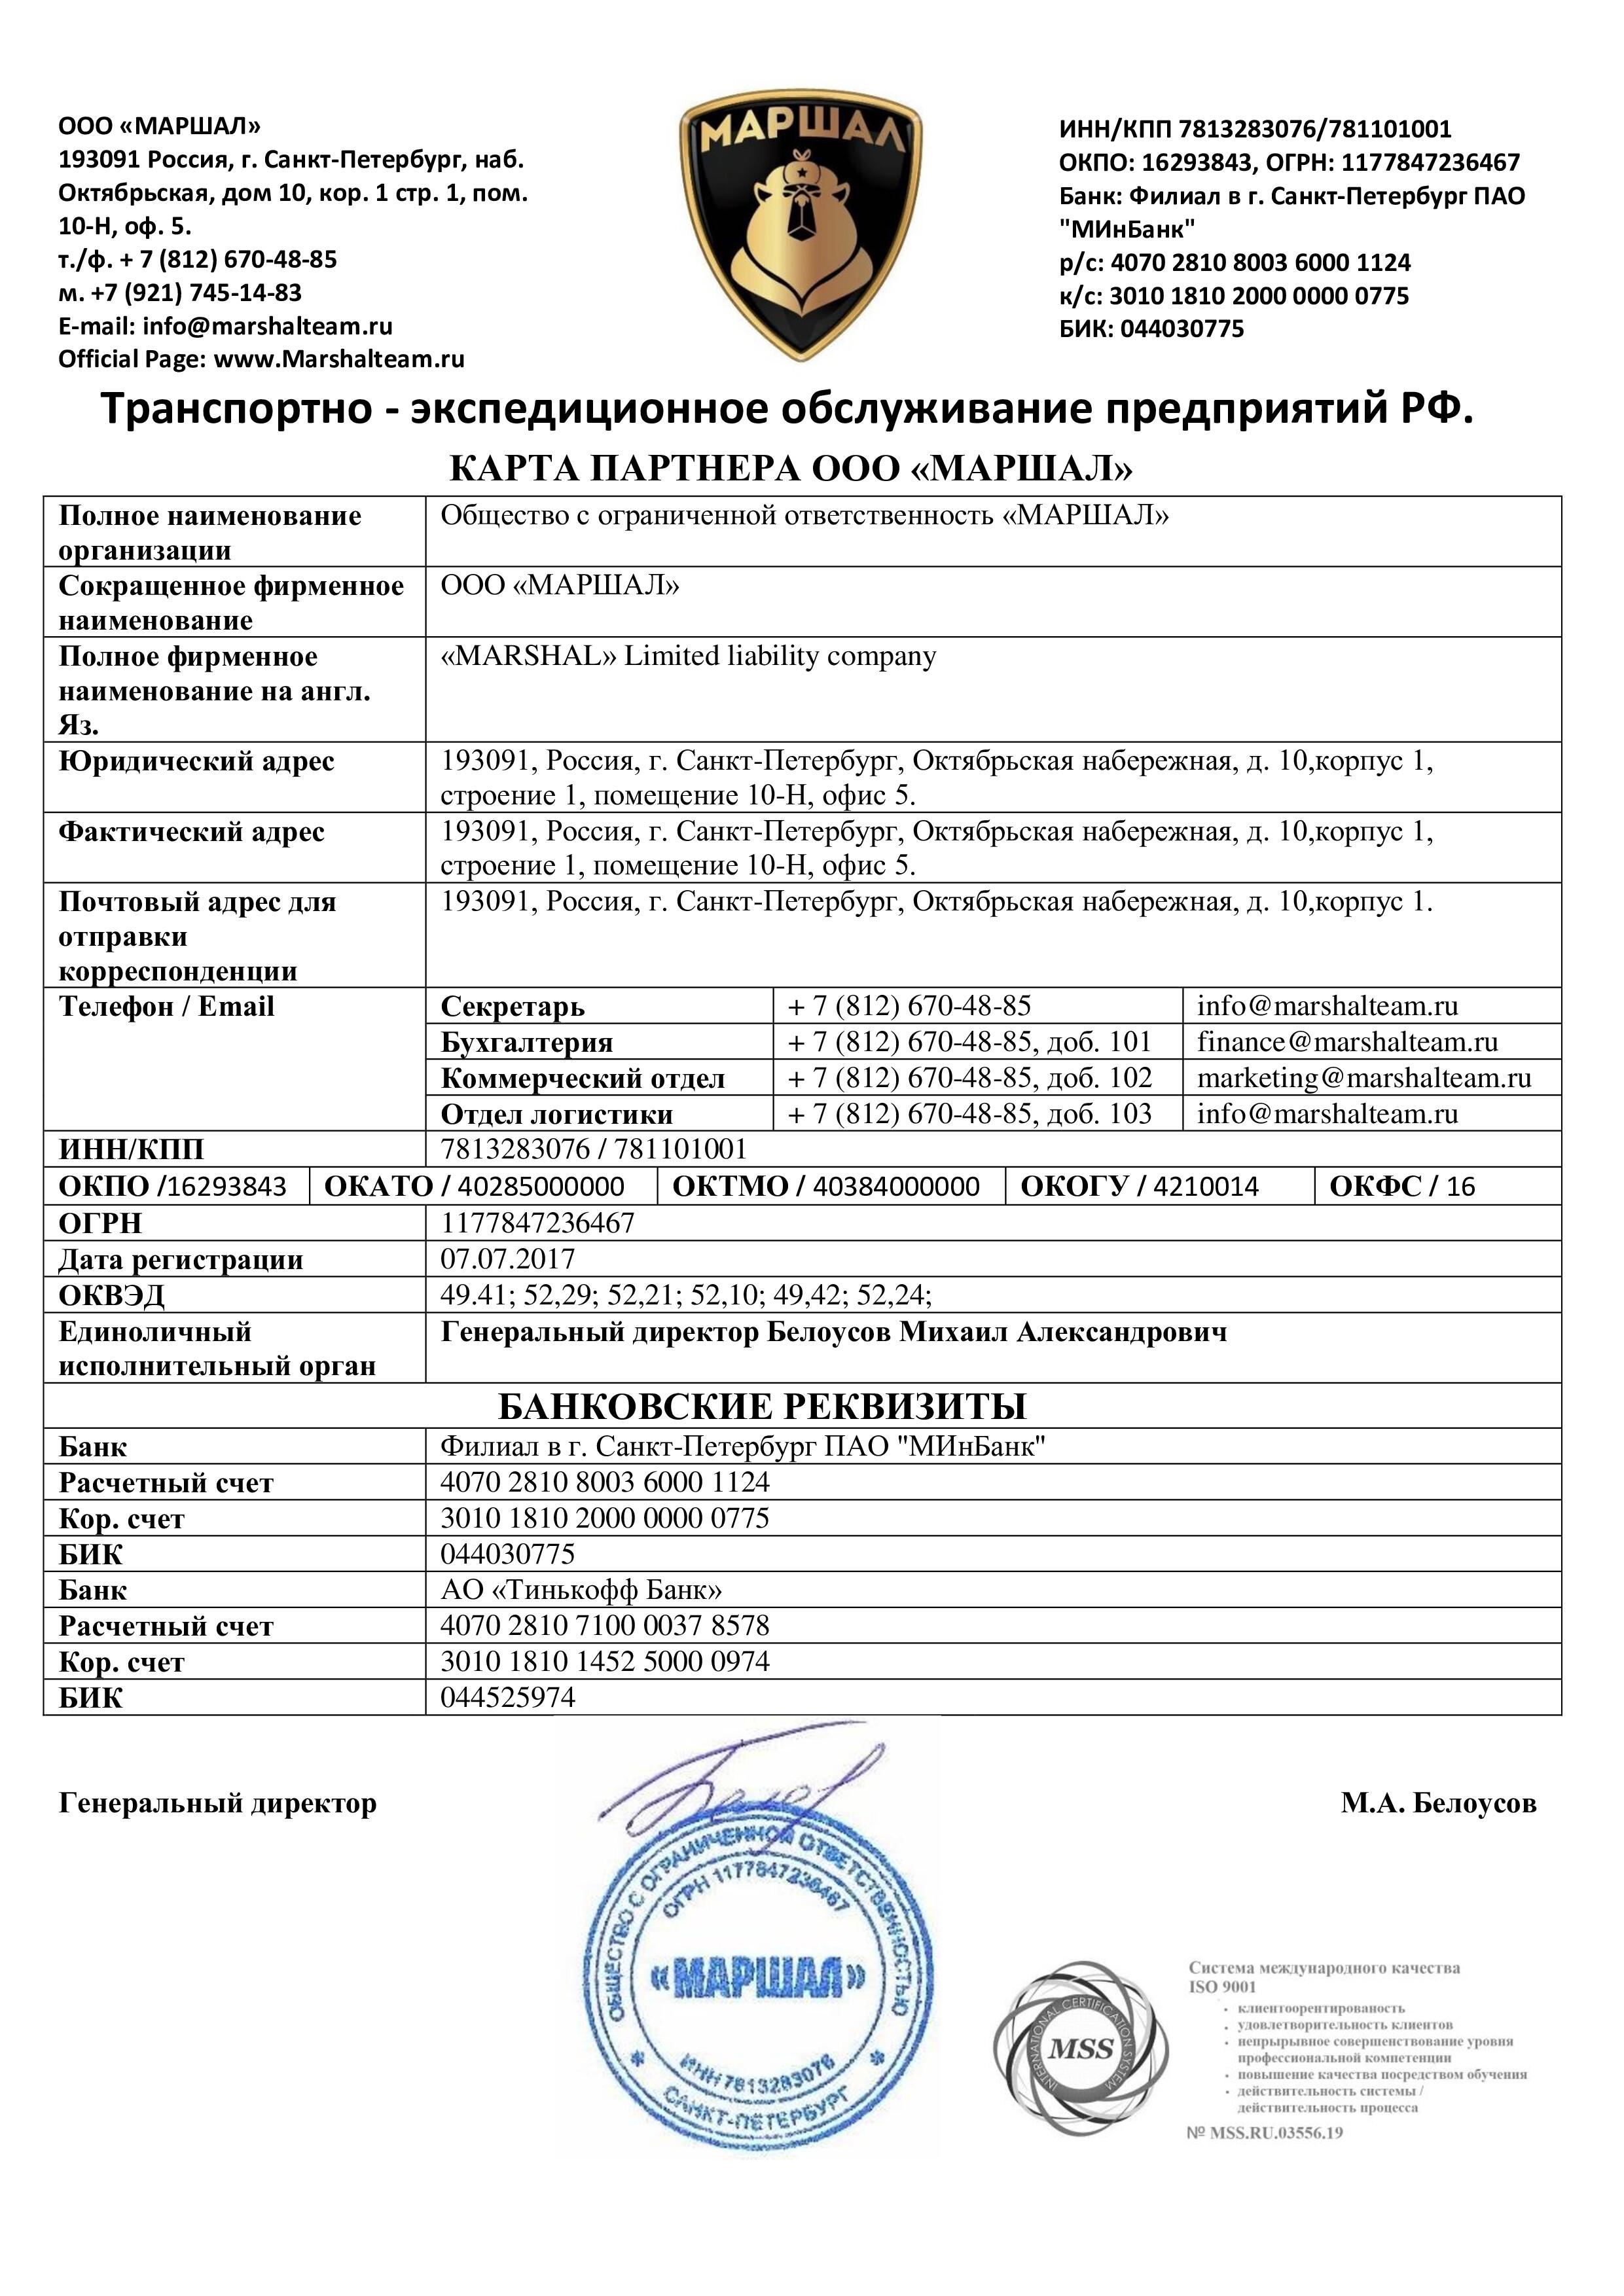 Карточка партнера ООО -МАРШАЛ-